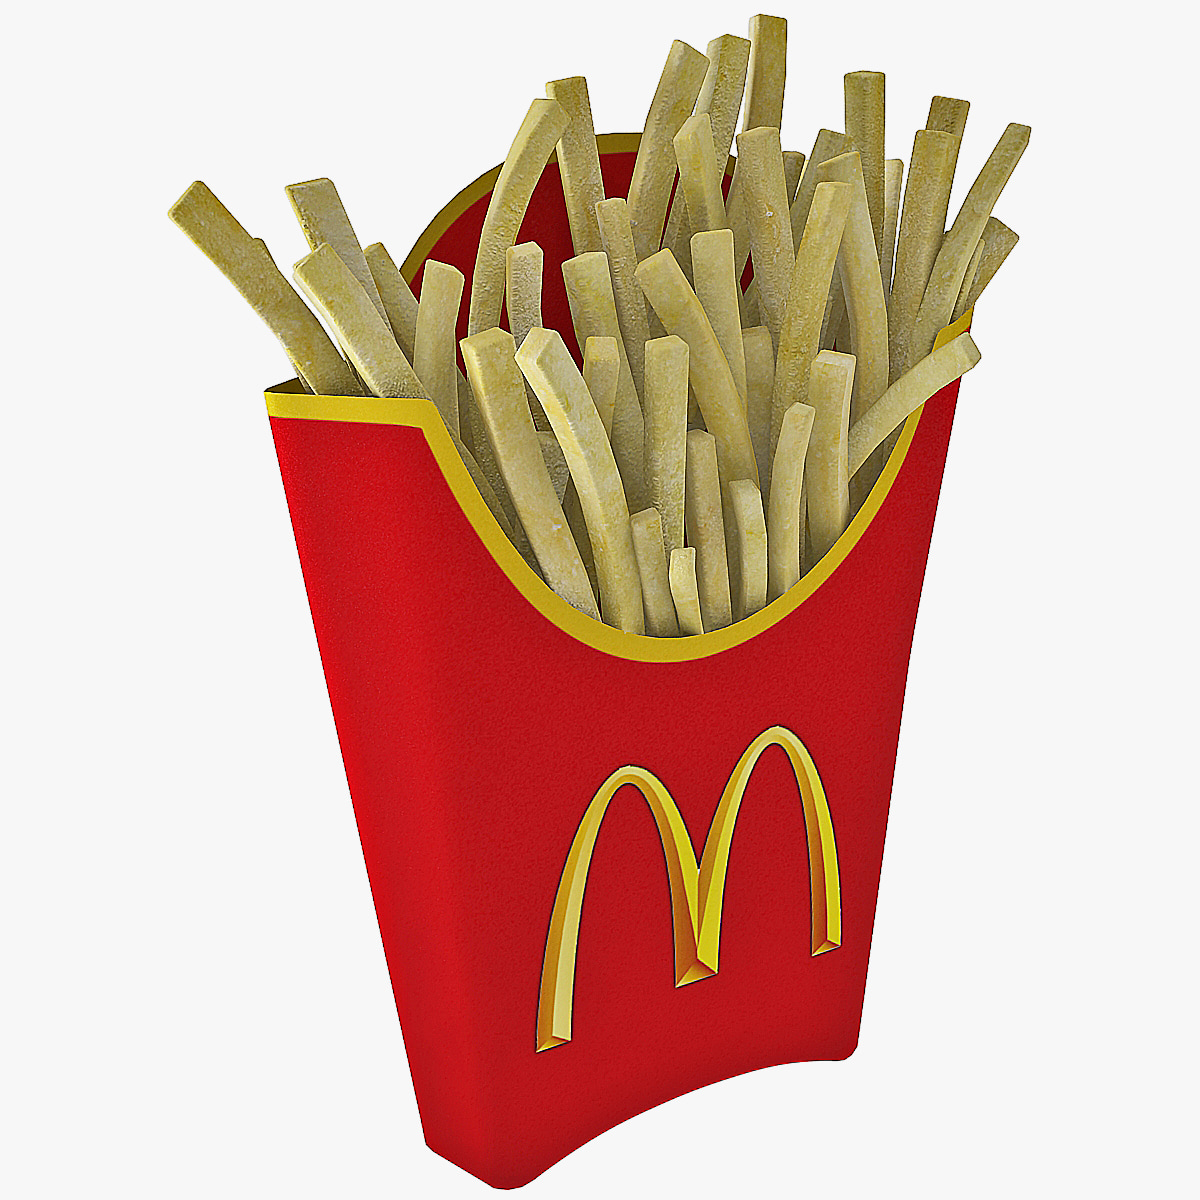 McDonalds_French_Fries_0.jpg